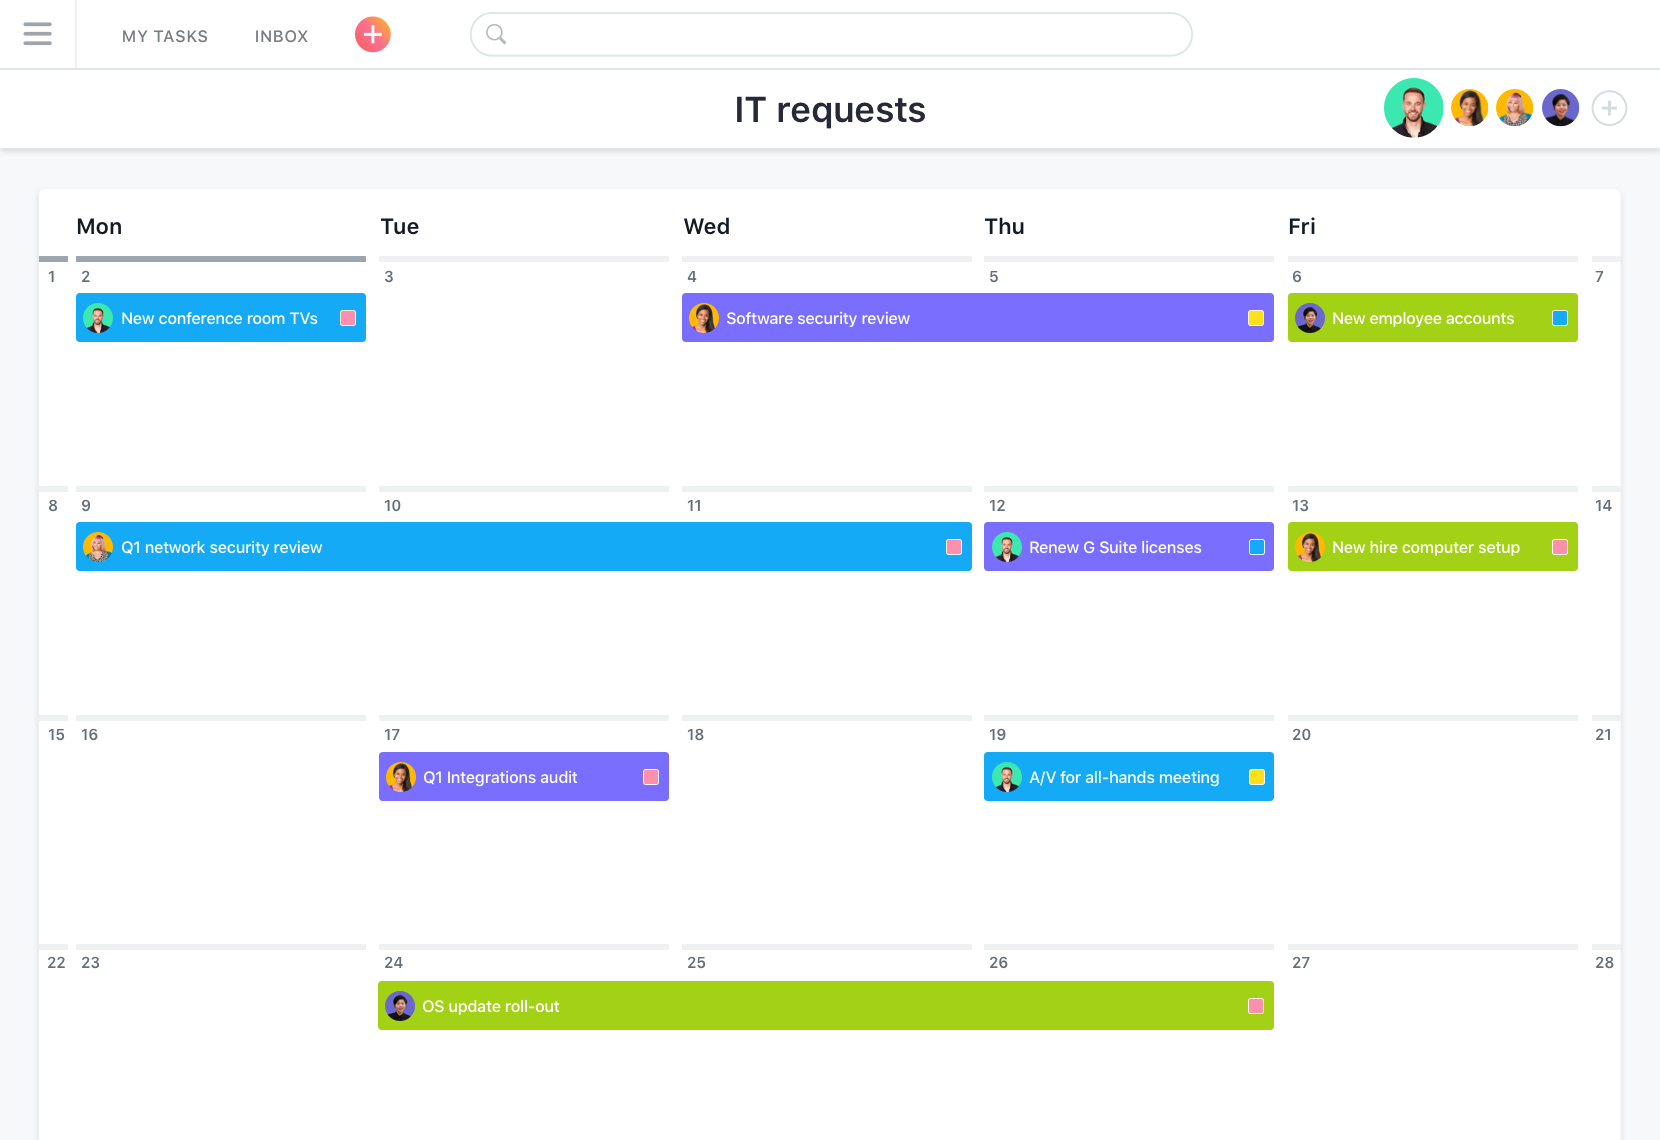 Asana calendar, Asana: Single Sign-On (SSO), Task Manager, Import and export data (CSV, XLS)